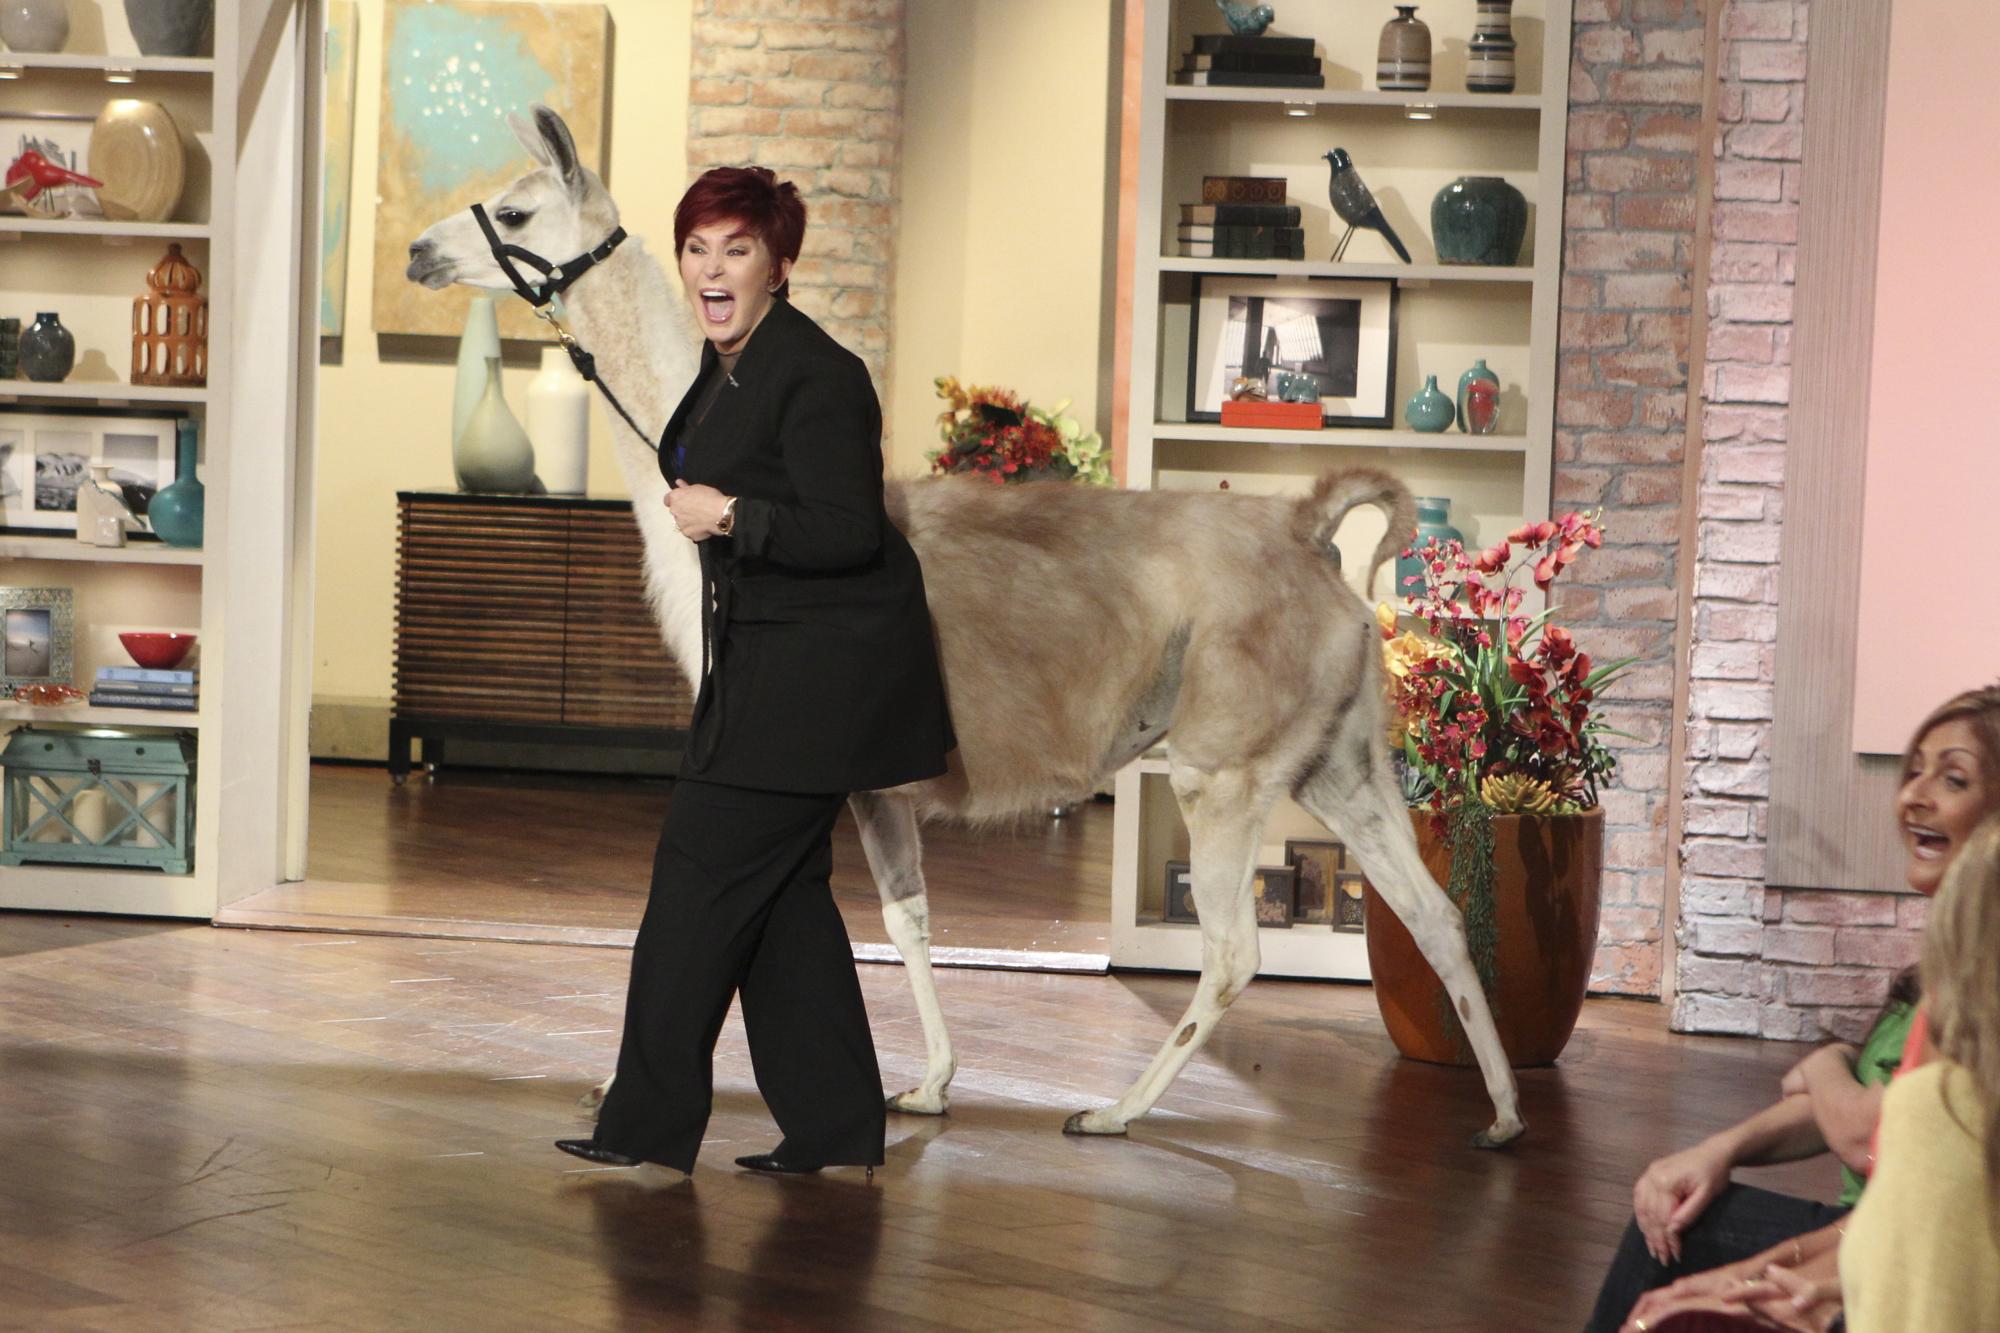 2. Llama Drama At THE TALK.